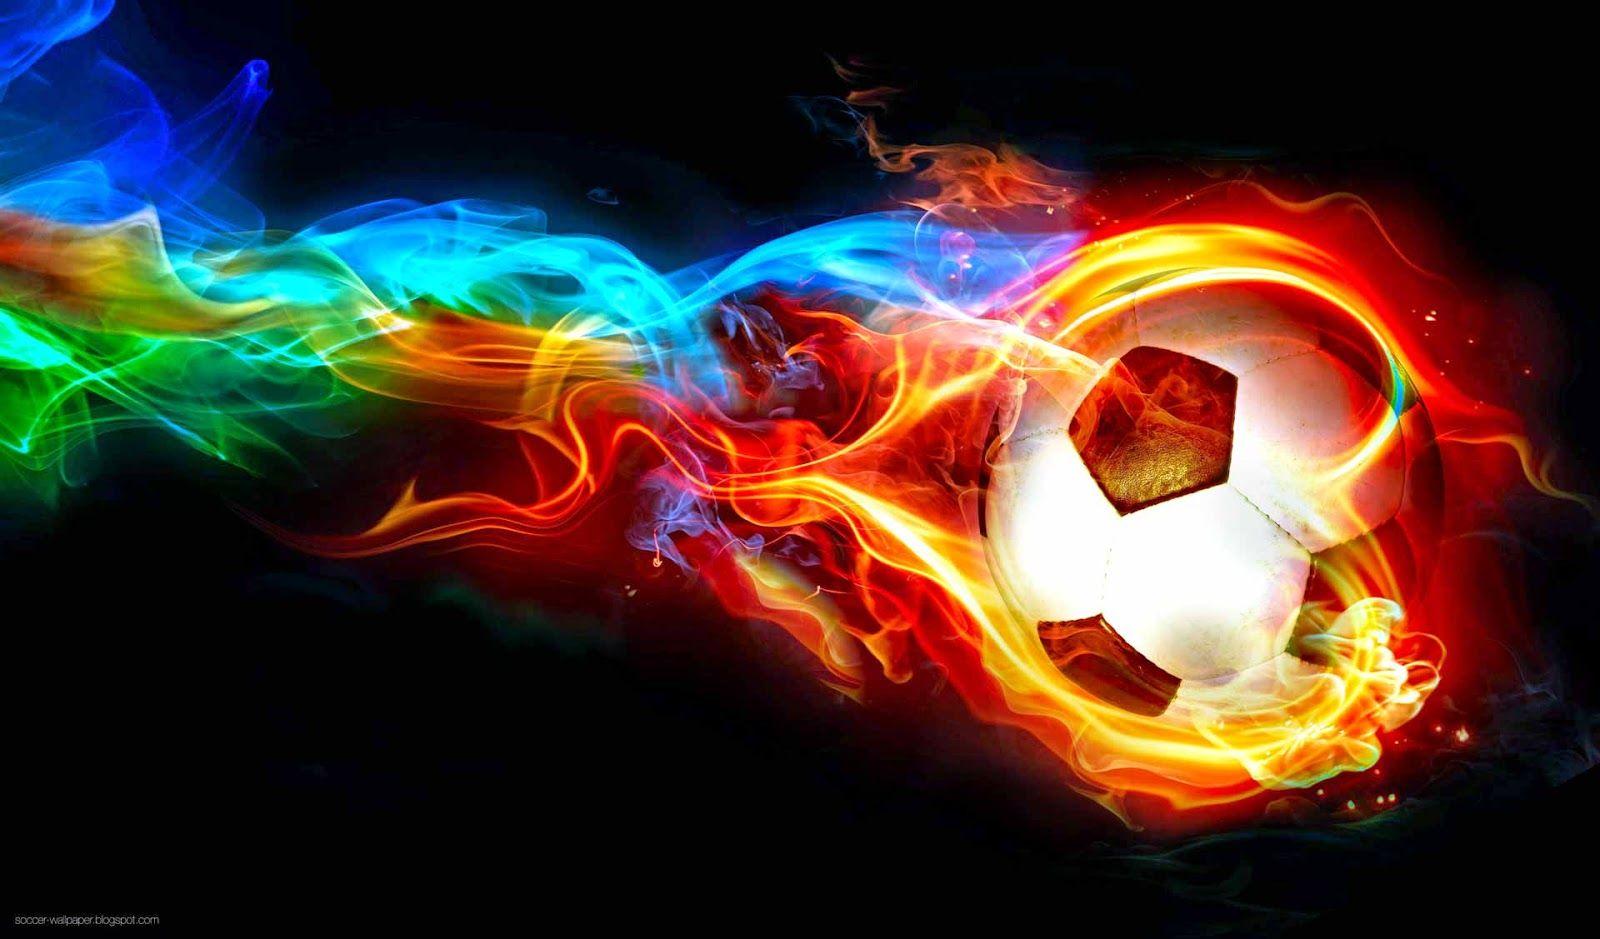 flaming soccer balls   Best Soccer Wallpaper of 2014   Sports ...